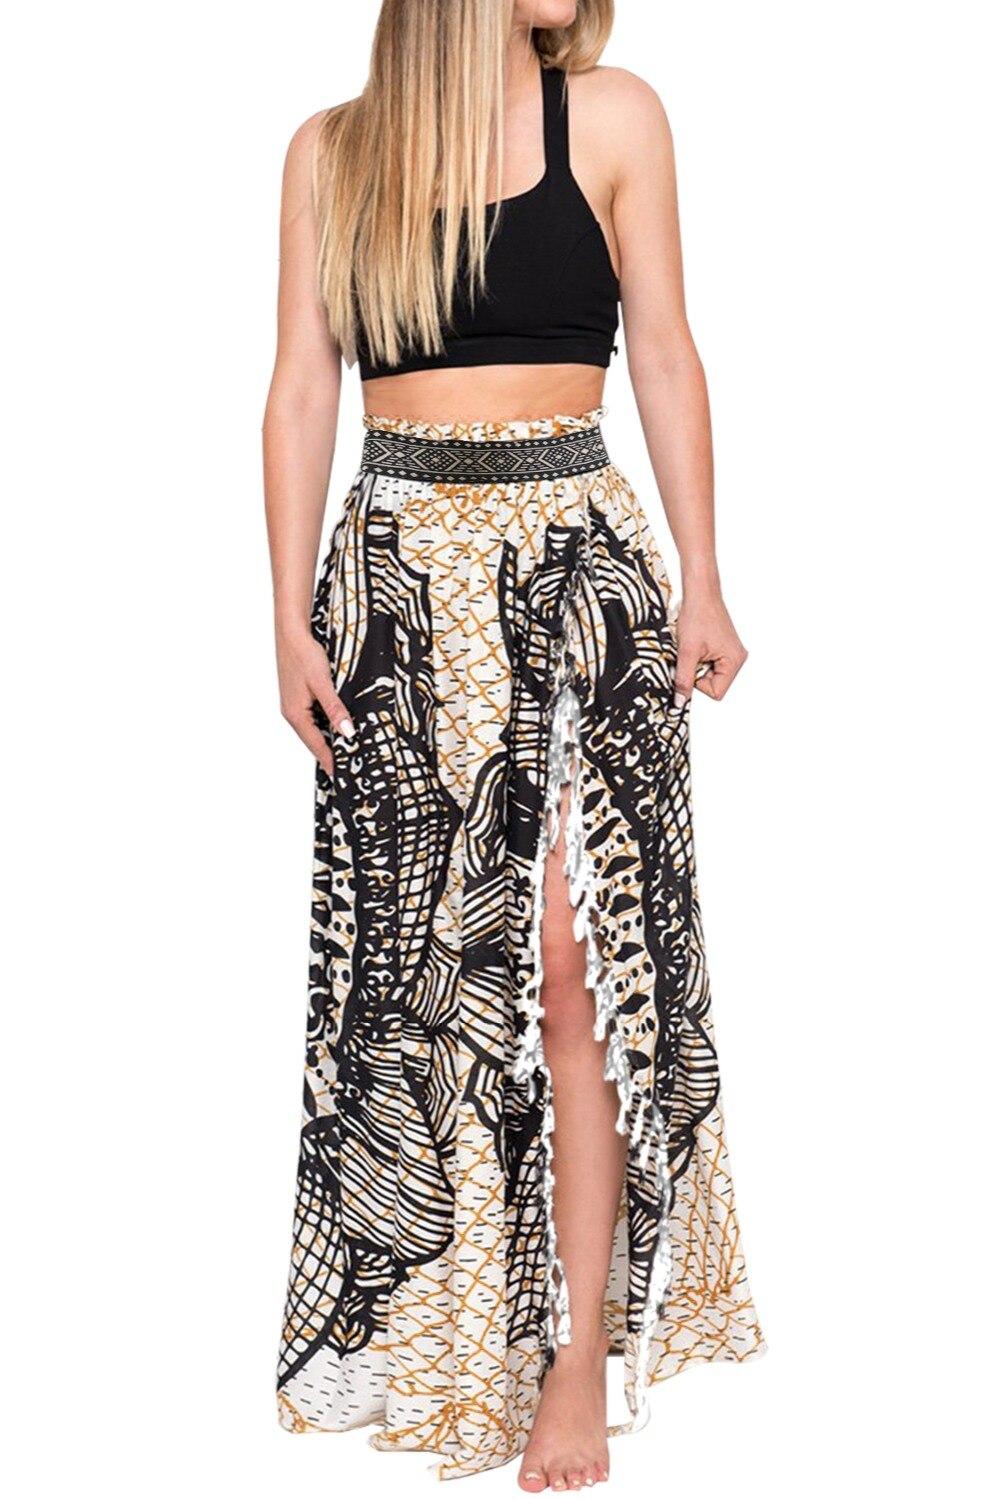 Fishnet-Mandala-Maxi-Skirt-LC420098-2-1